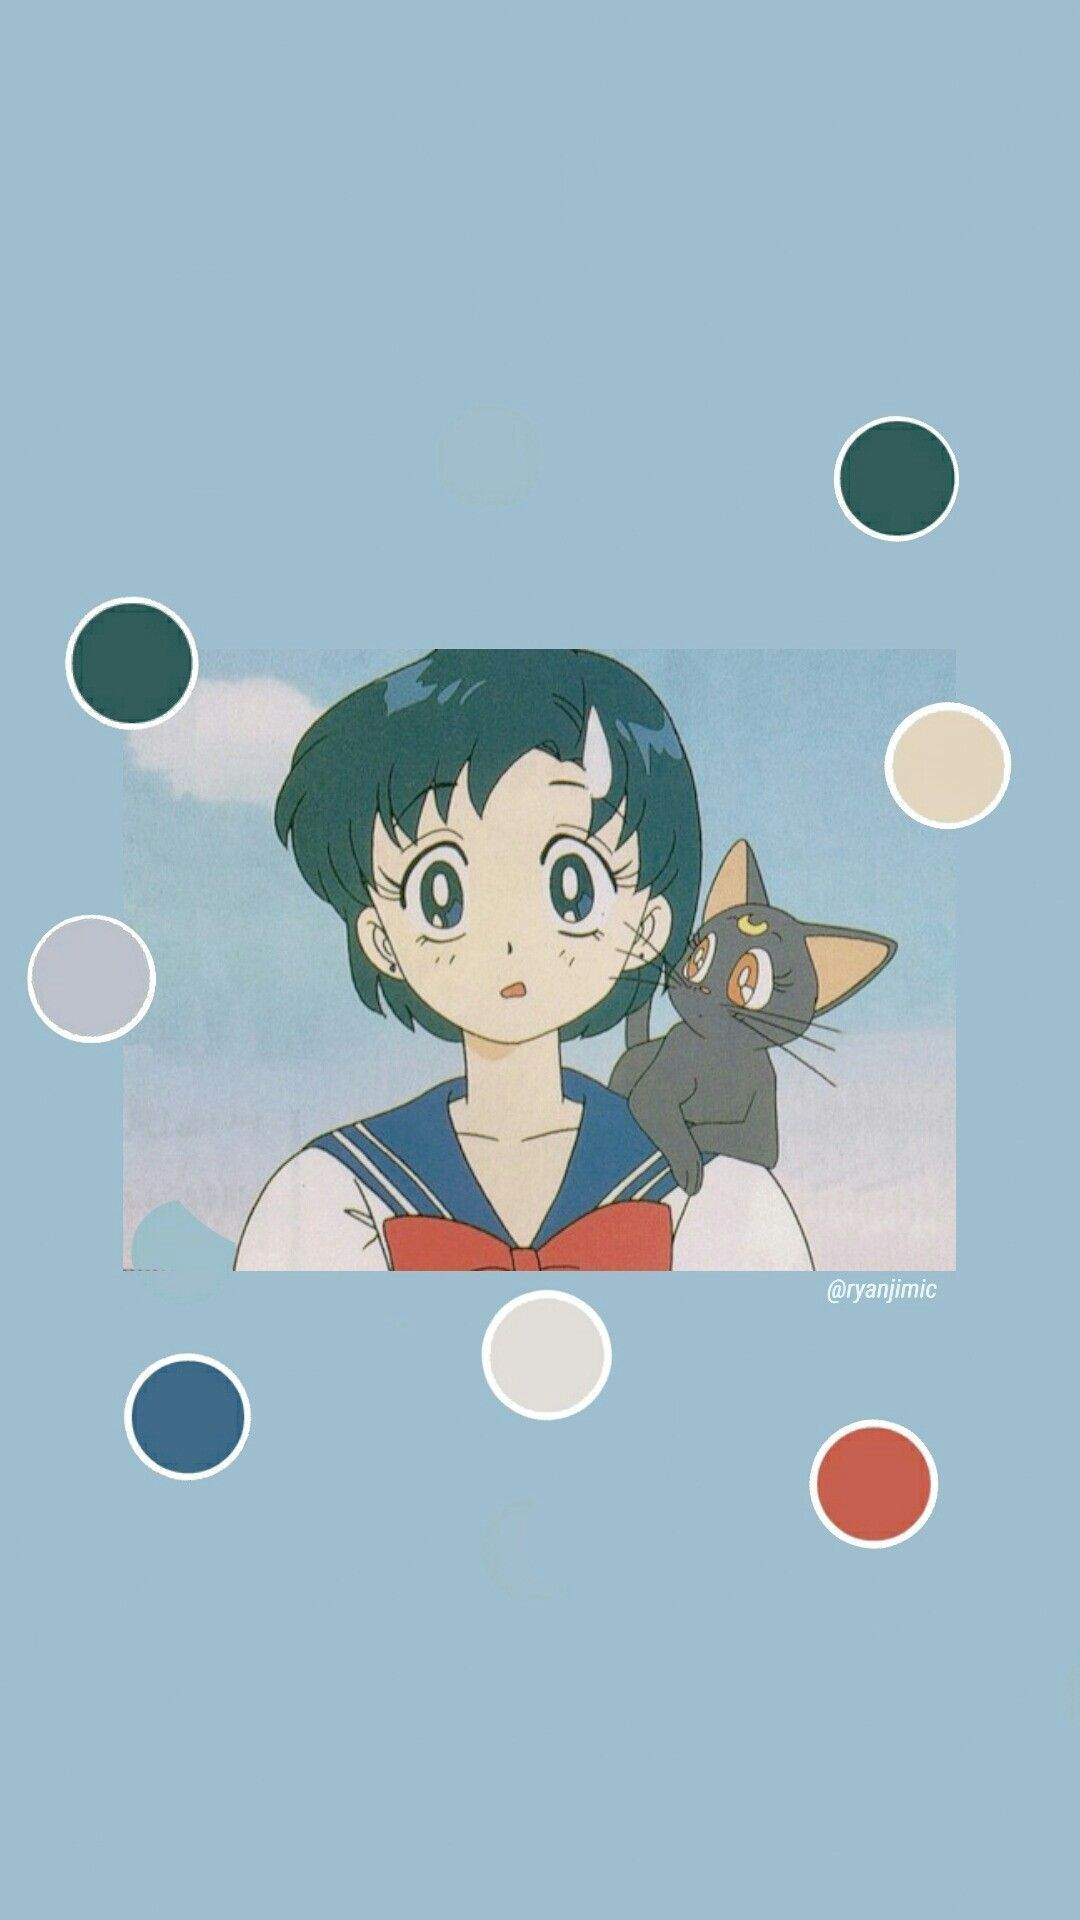 Aesthetic Wallpaper Ipad Mini Bts Ipad Mini Wallpaper Aesthetic Sailor Moon Wallpaper Ipad Mini Wallpaper Cute Cartoon Wallpapers